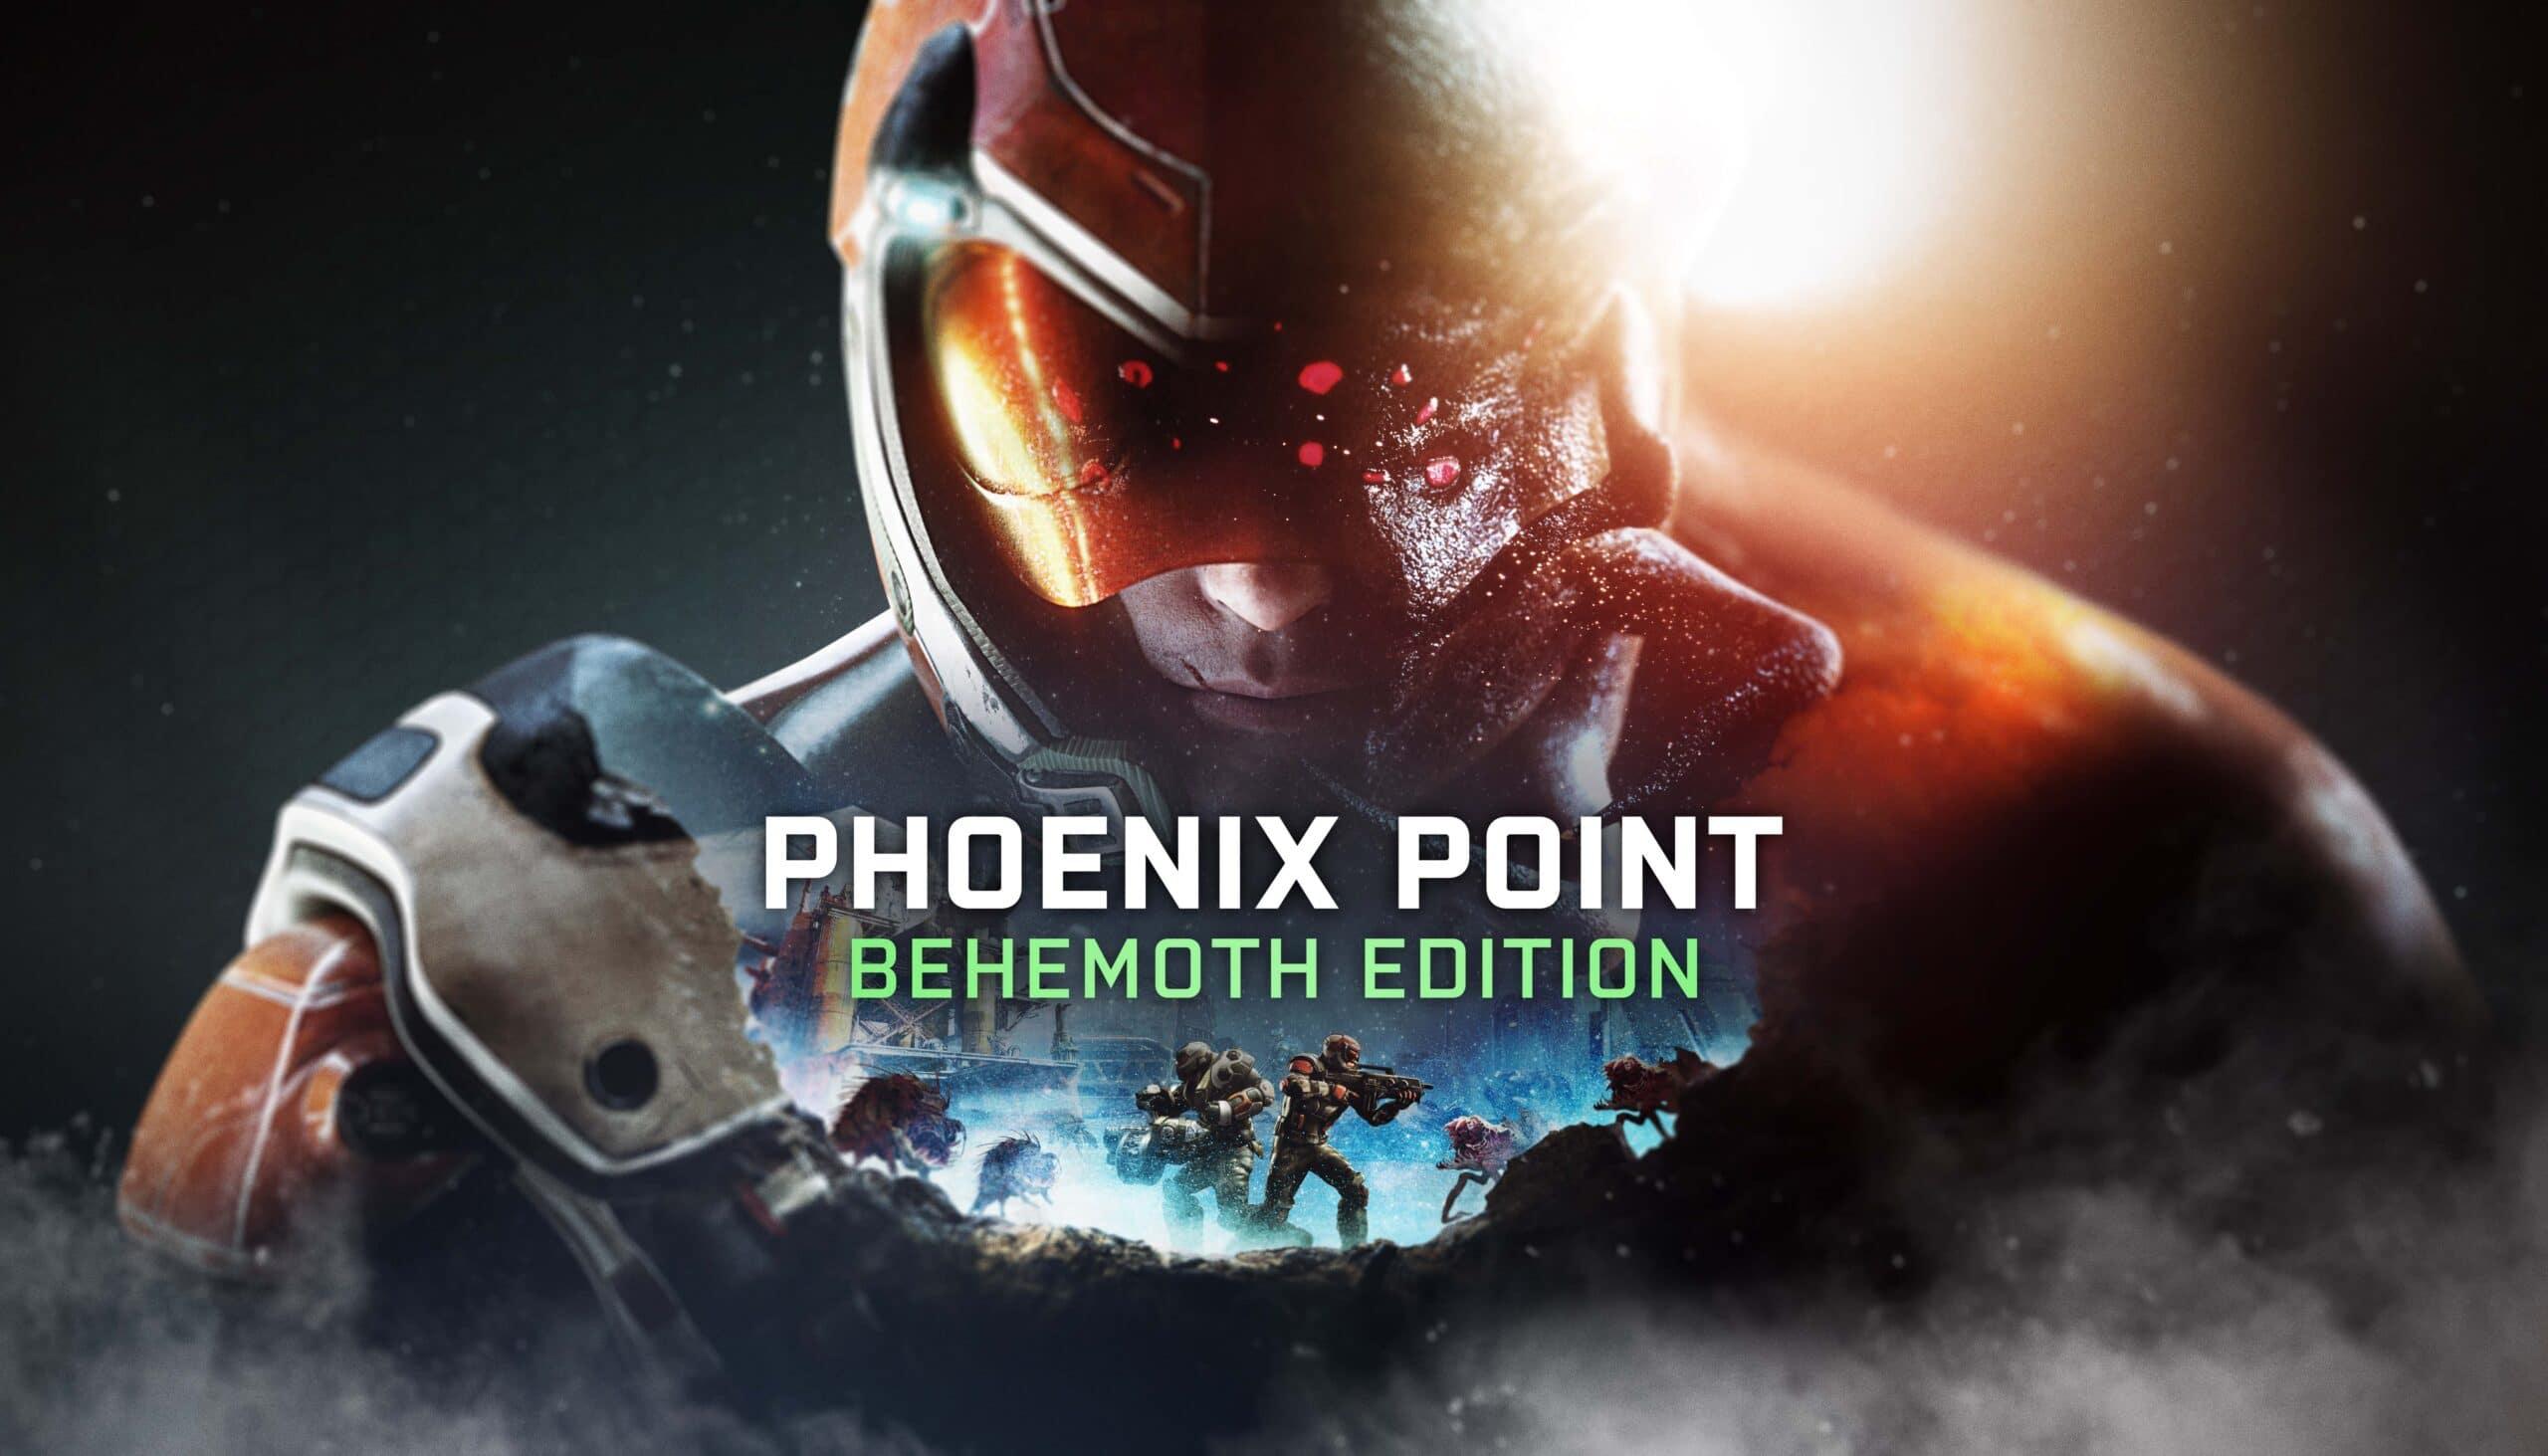 Phoenix Point: Behemoth Edition su Play Station 4 e Xbox One